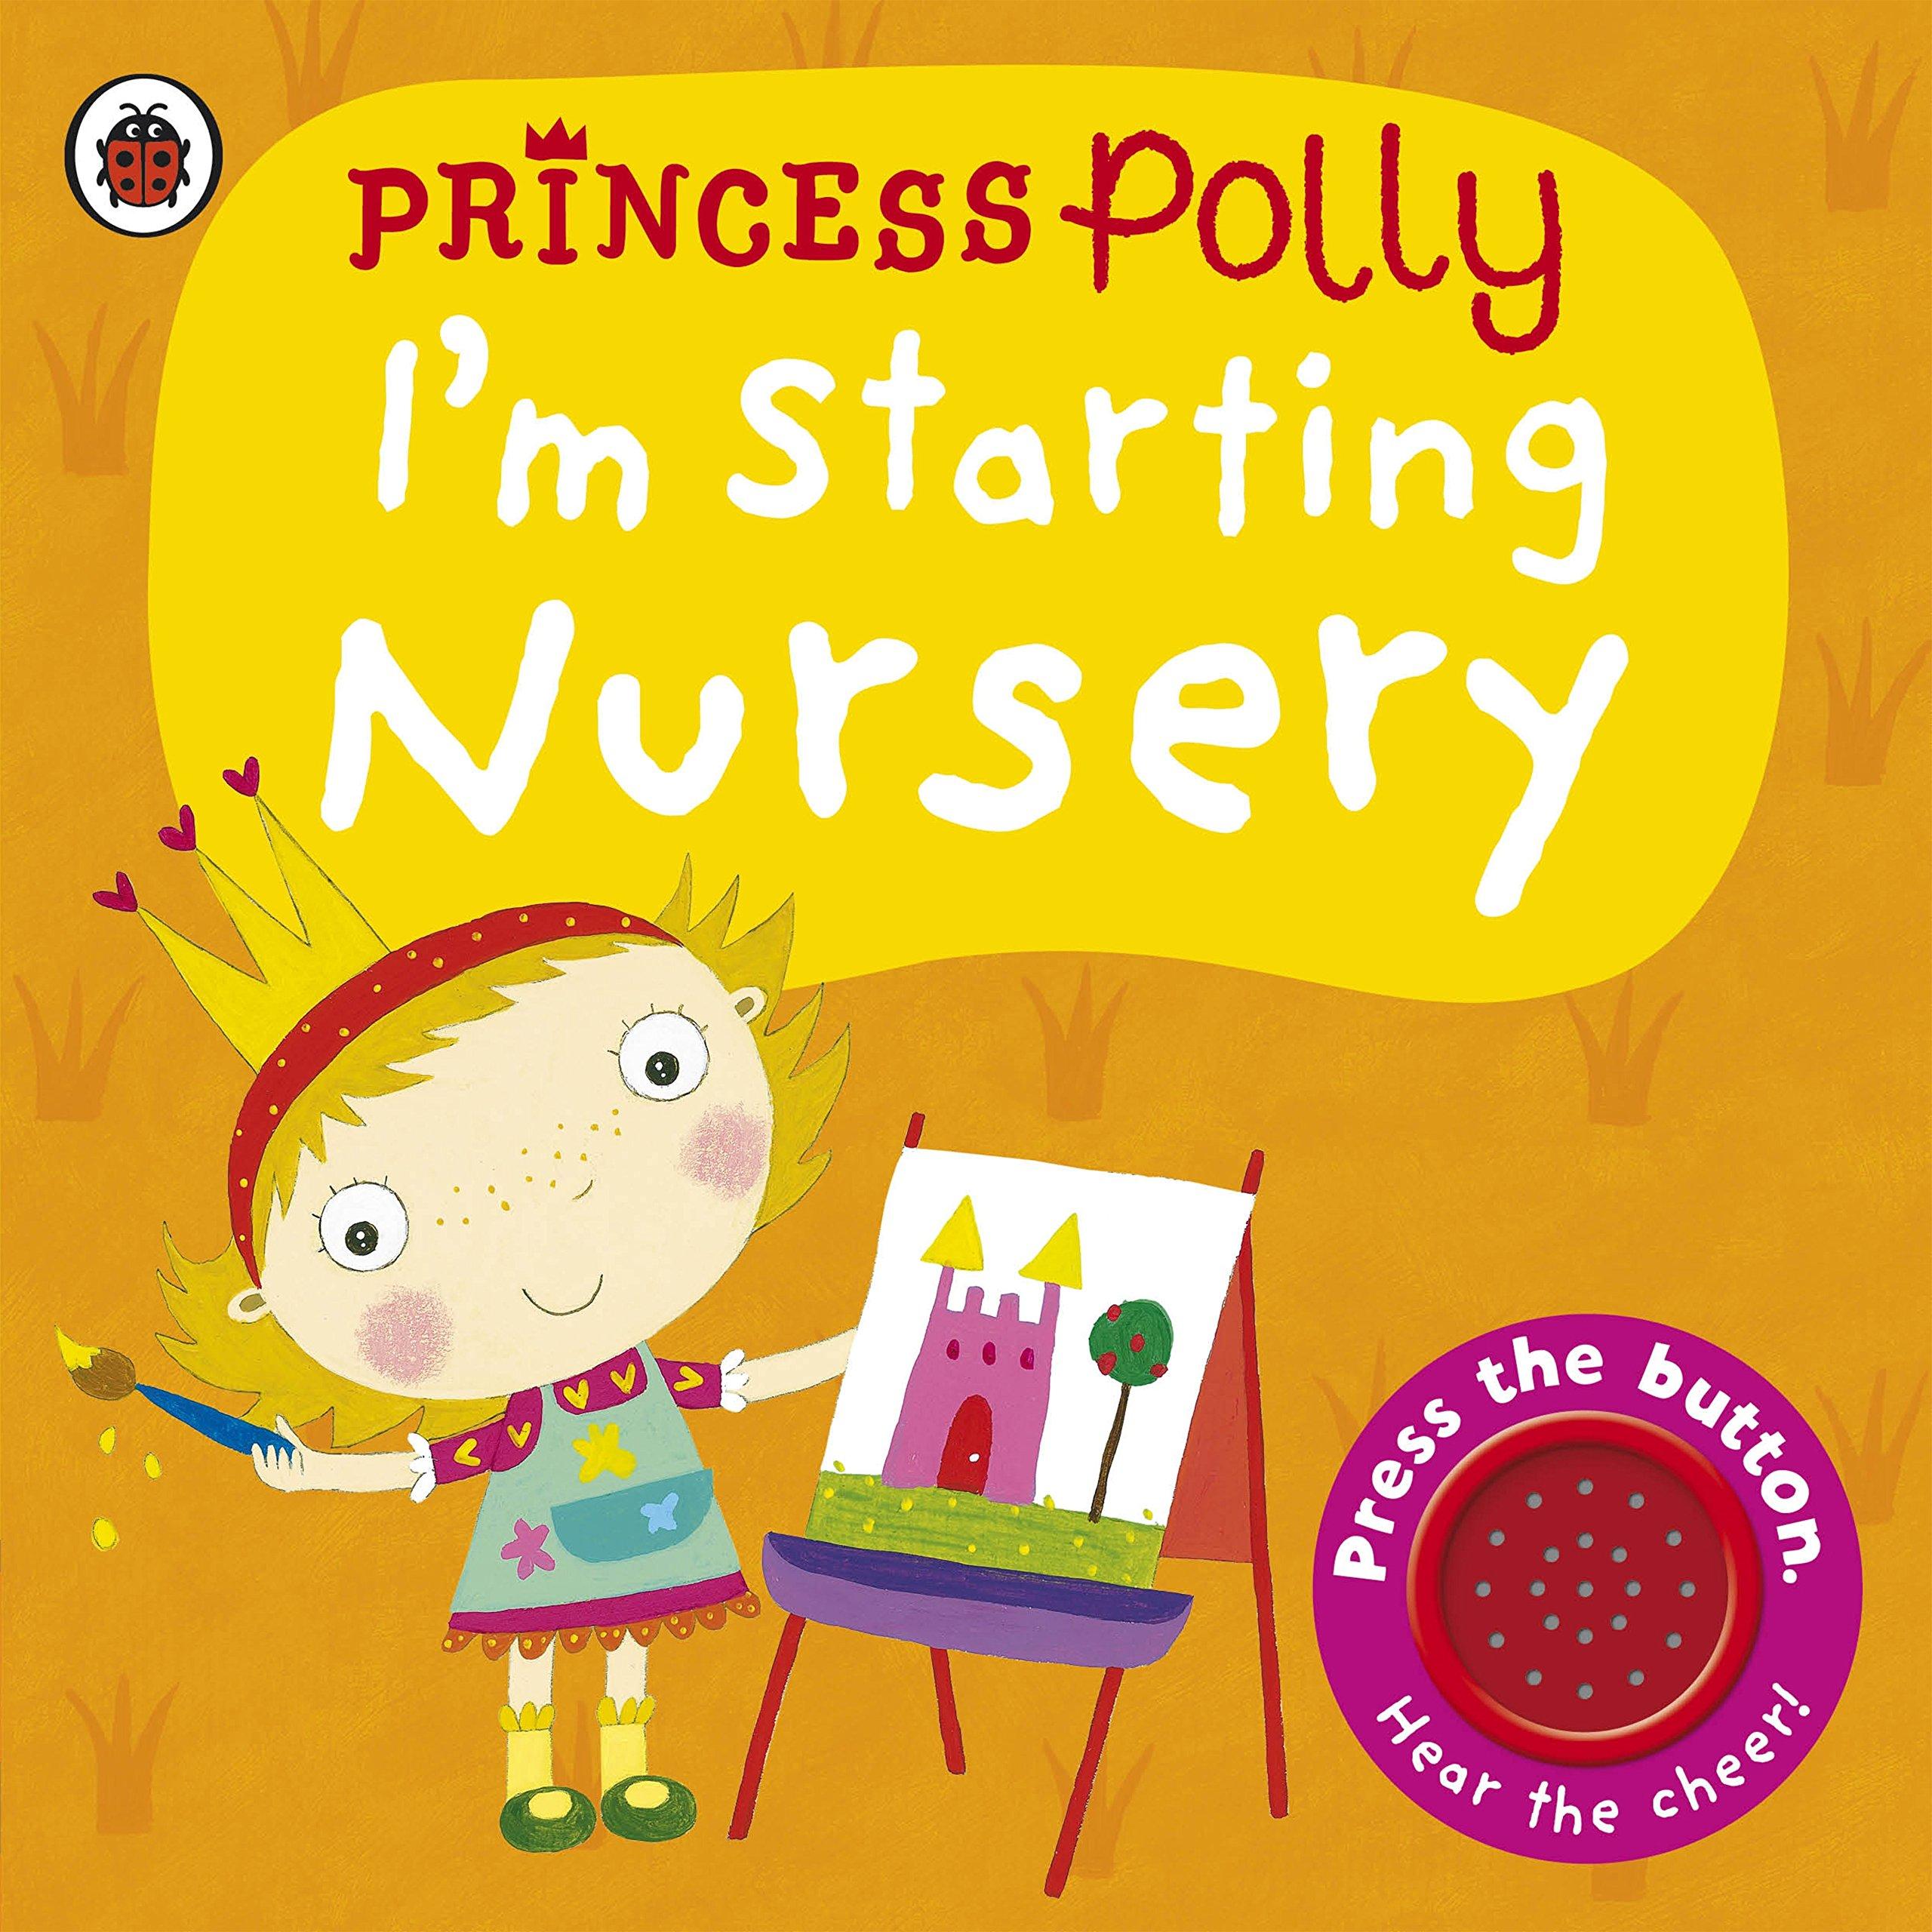 I m Starting Nursery A Princess Polly book Amazon Amanda Li